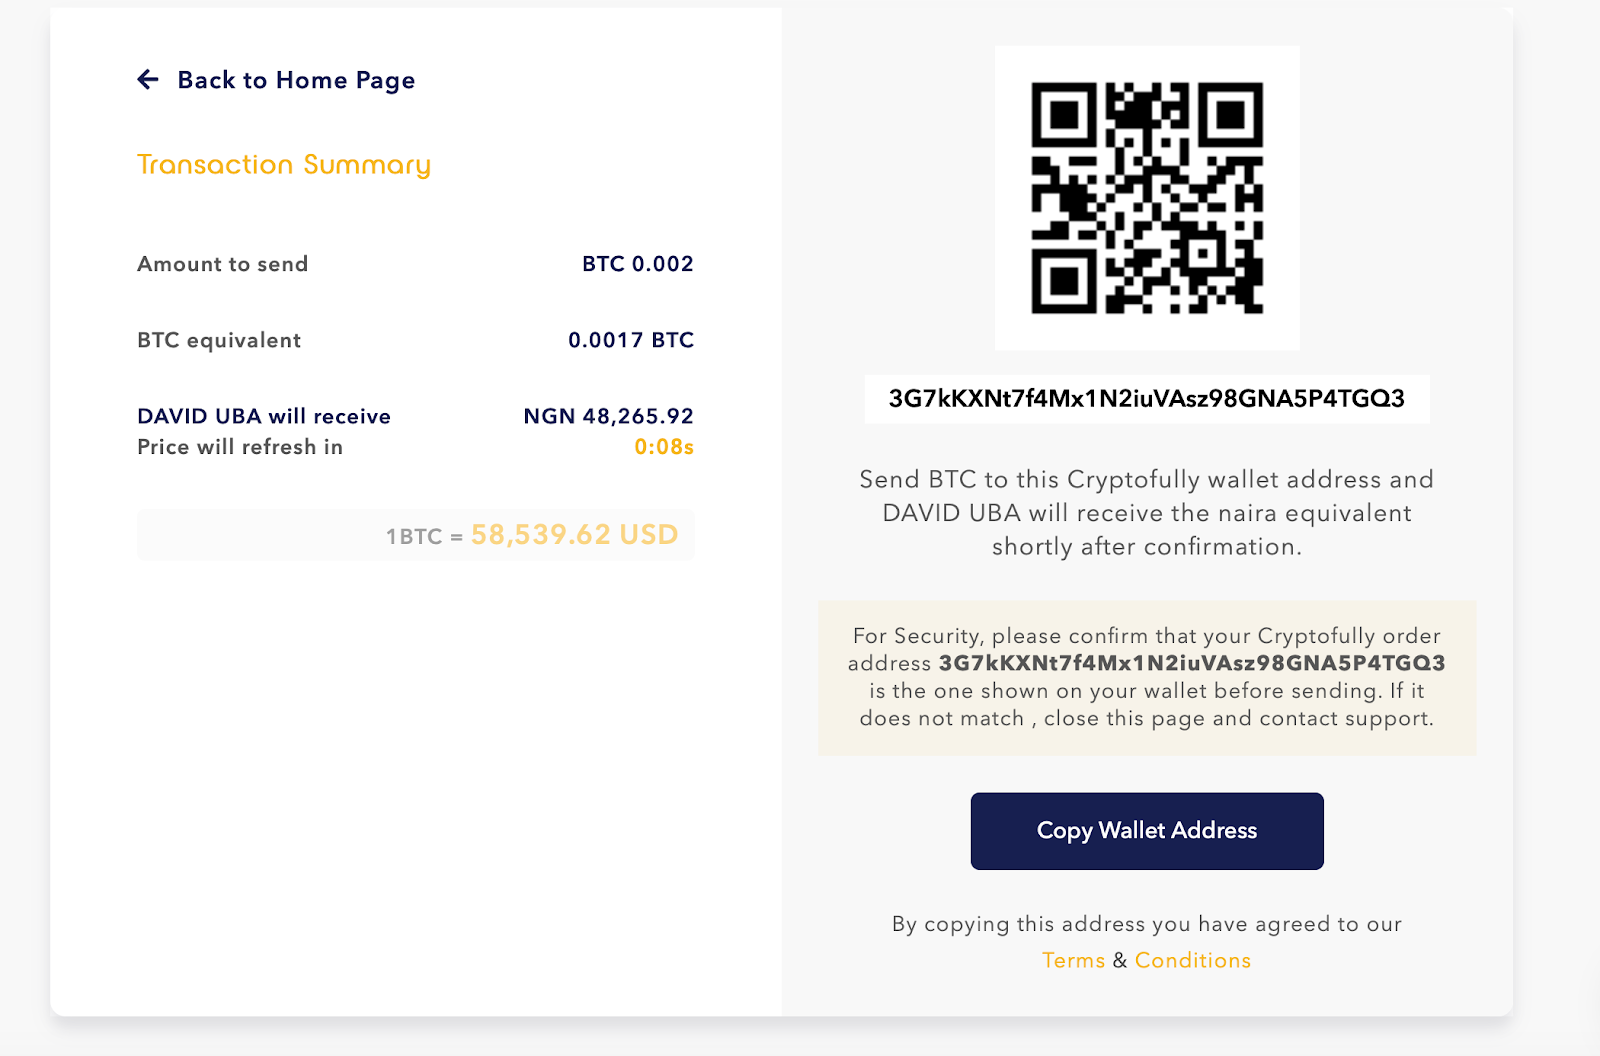 Cryptofully app payment